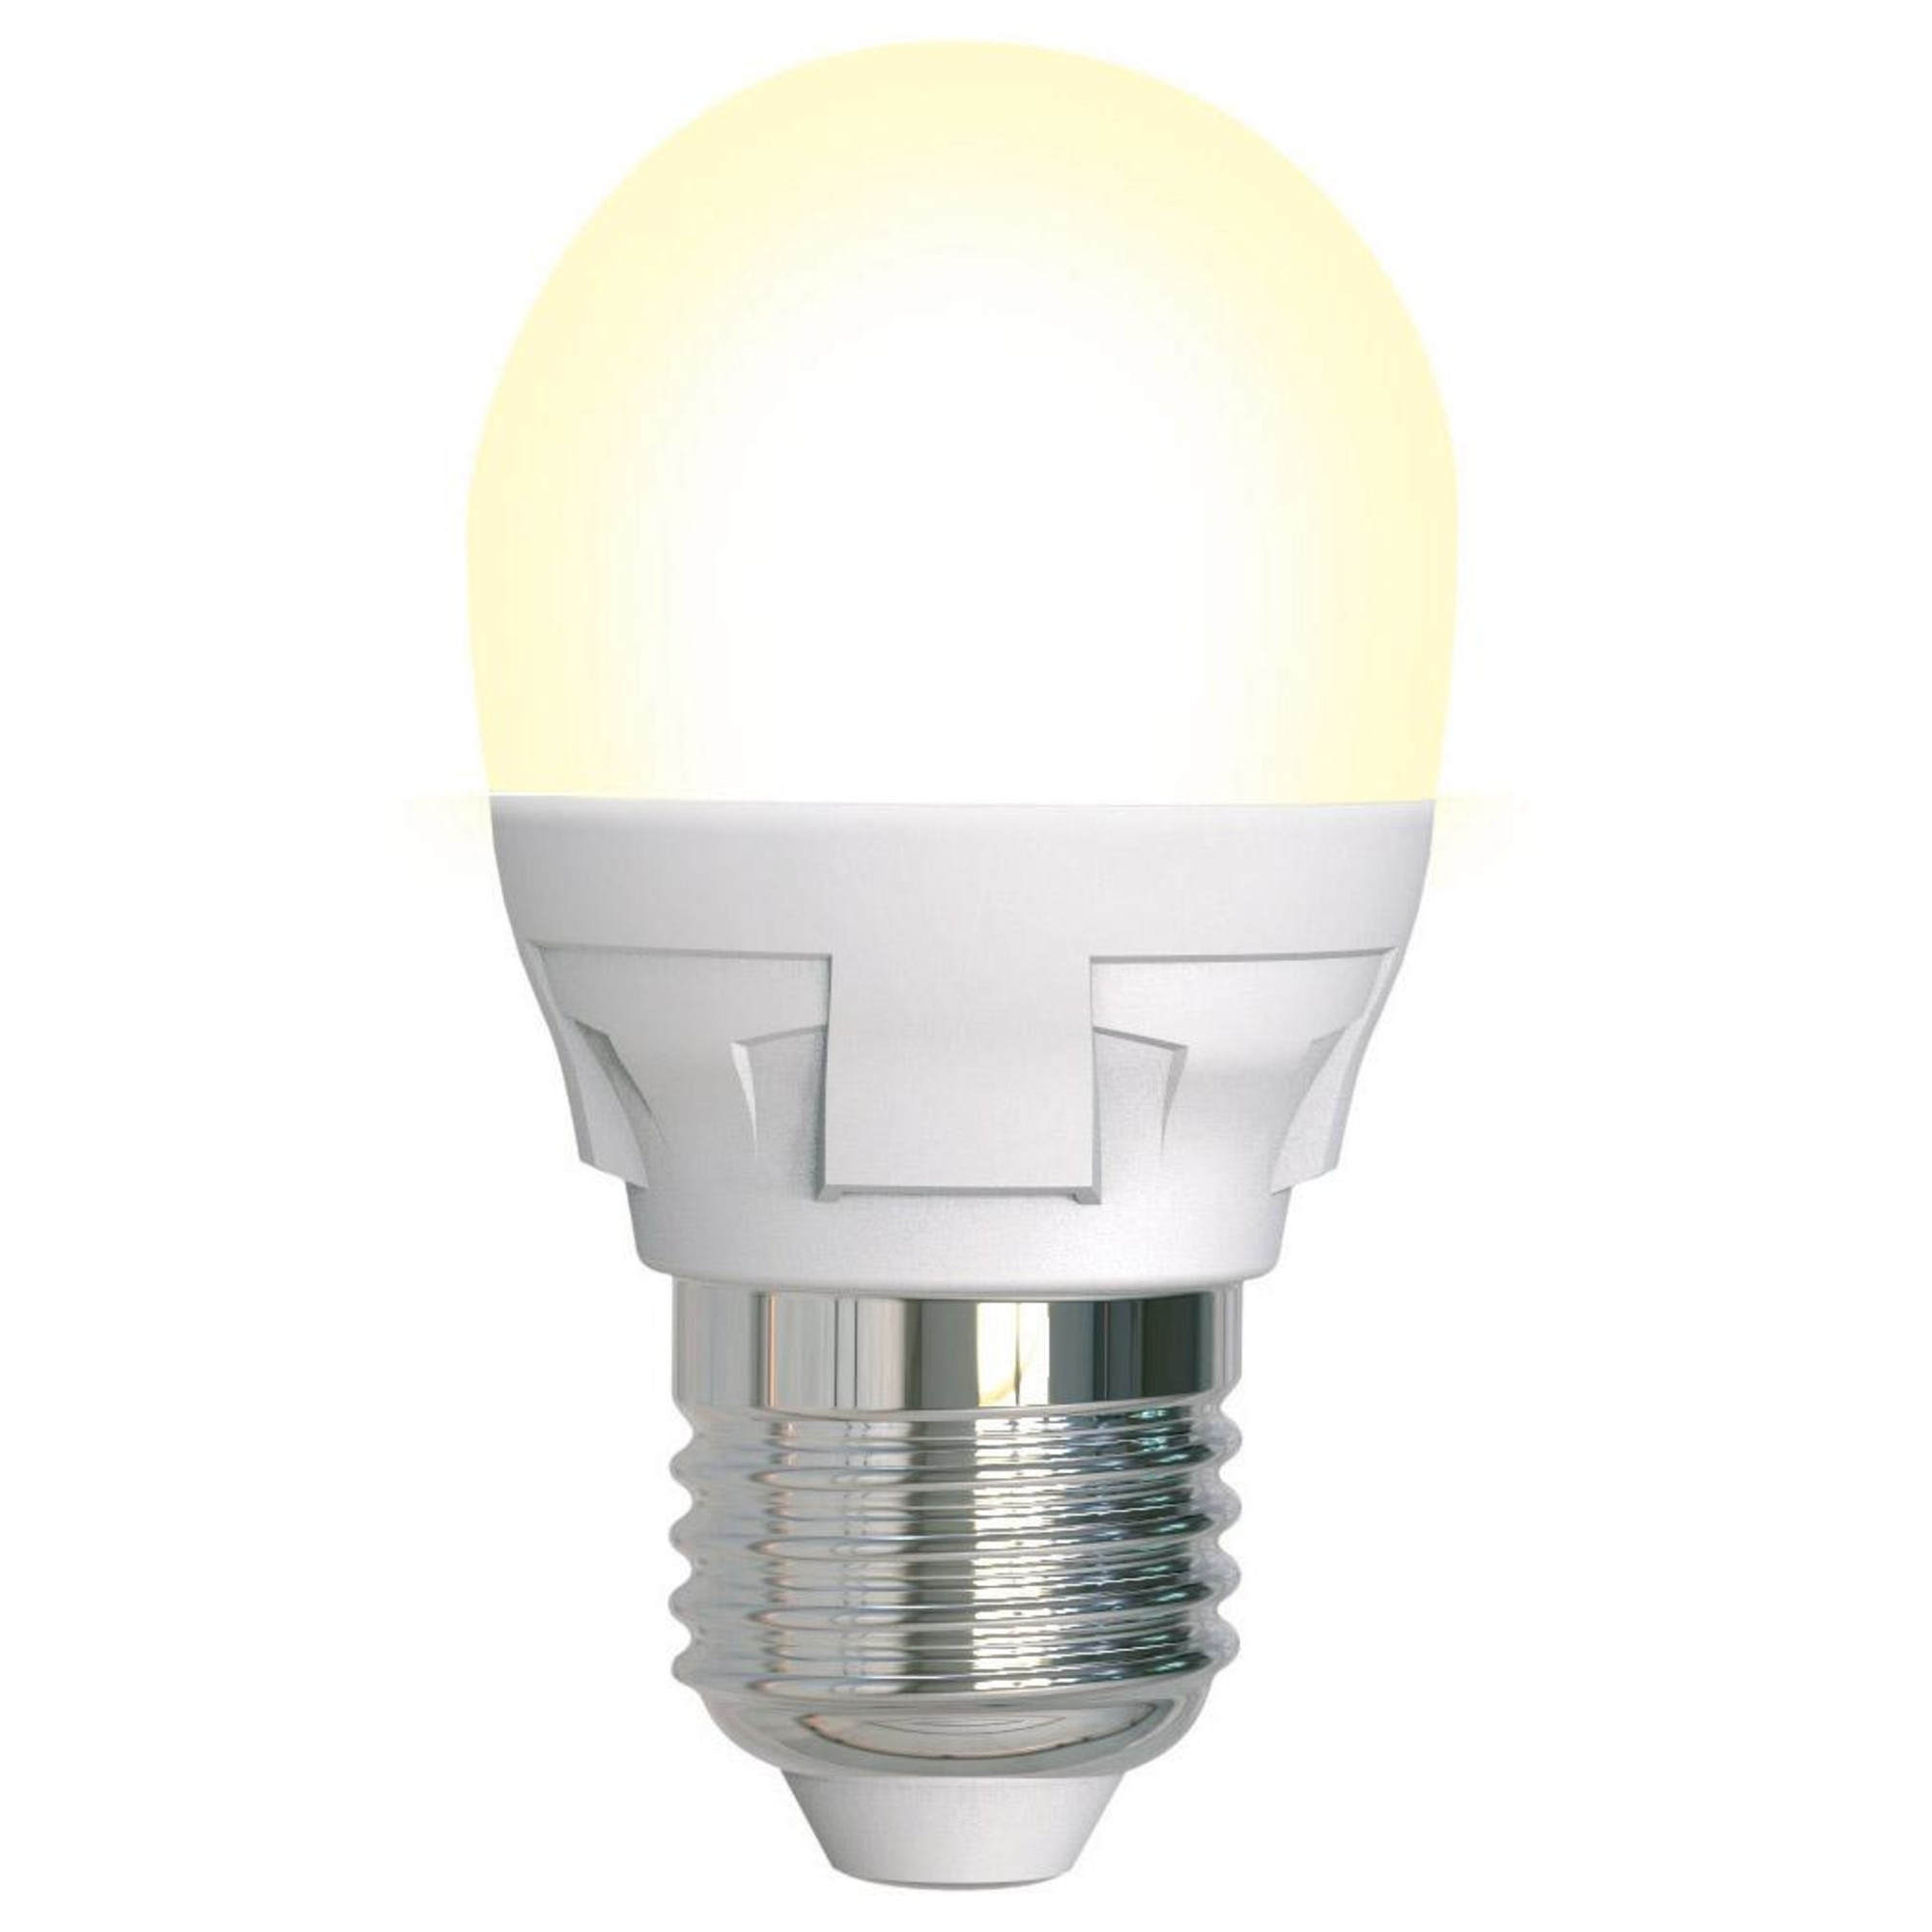 Лампа светодиодная Uniel Яркая Dimmable E27 шар 600 Лм 7 Вт теплый белый (желтый)